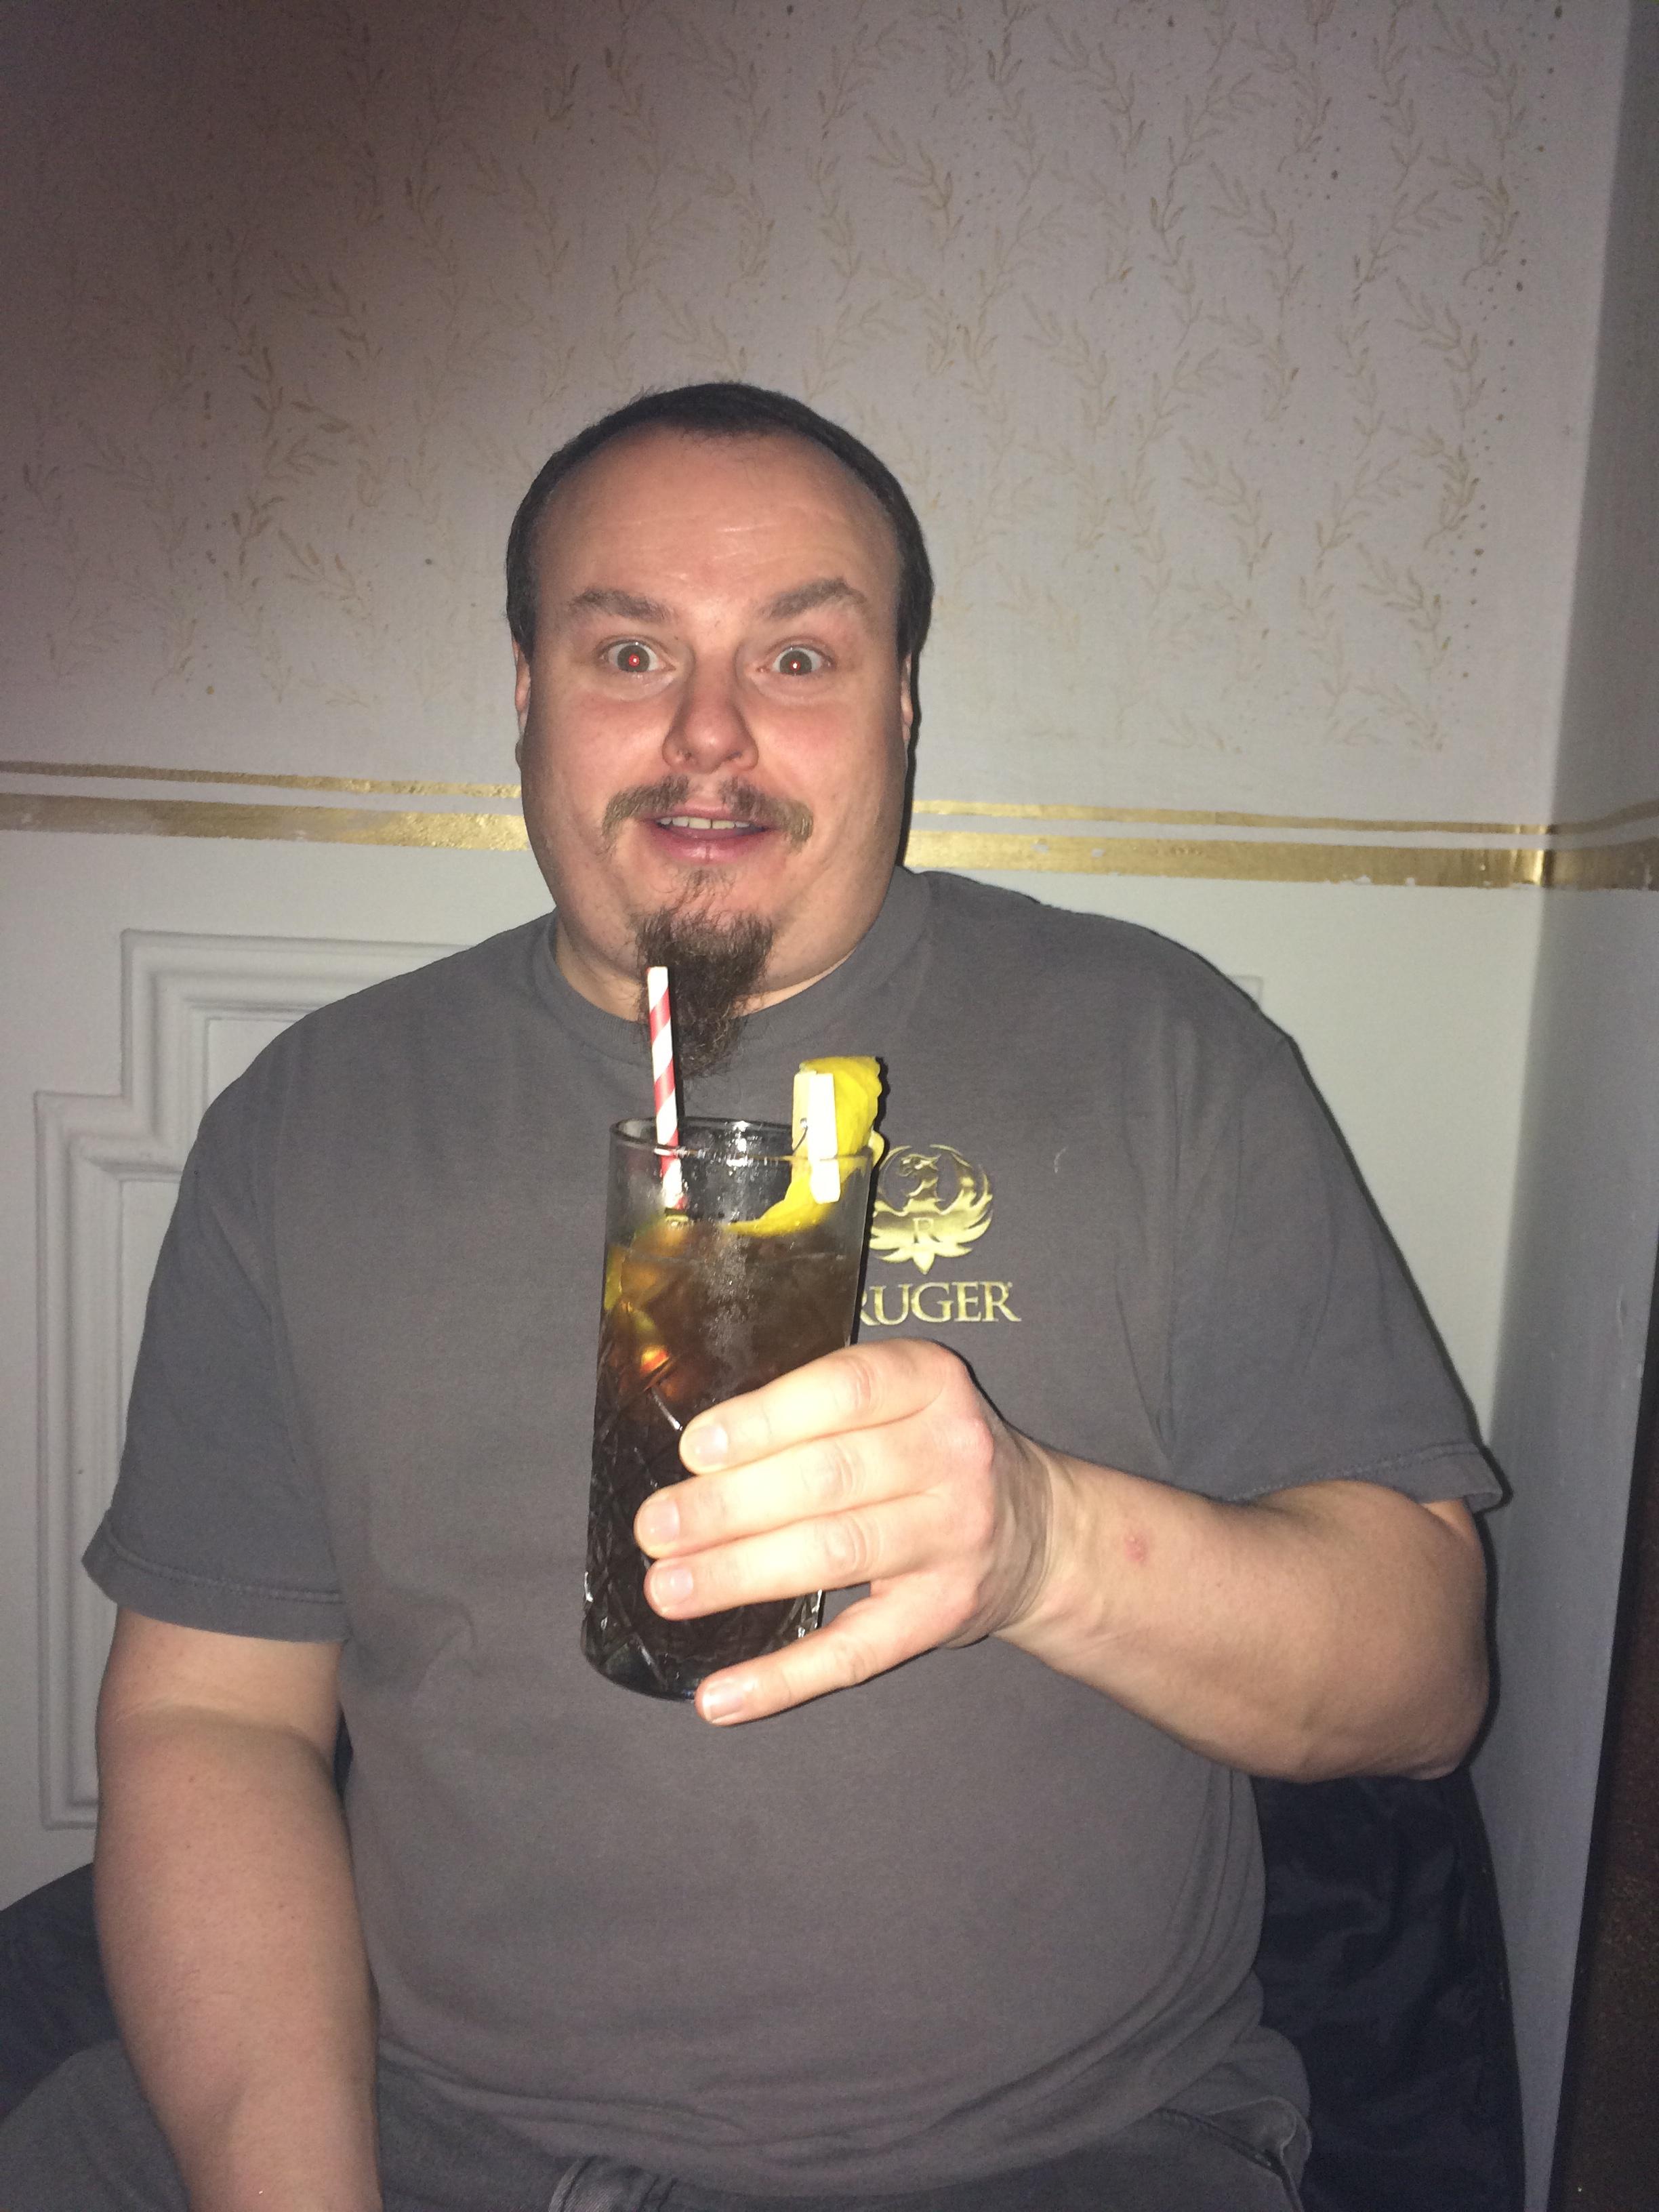 An alchemist cocktail